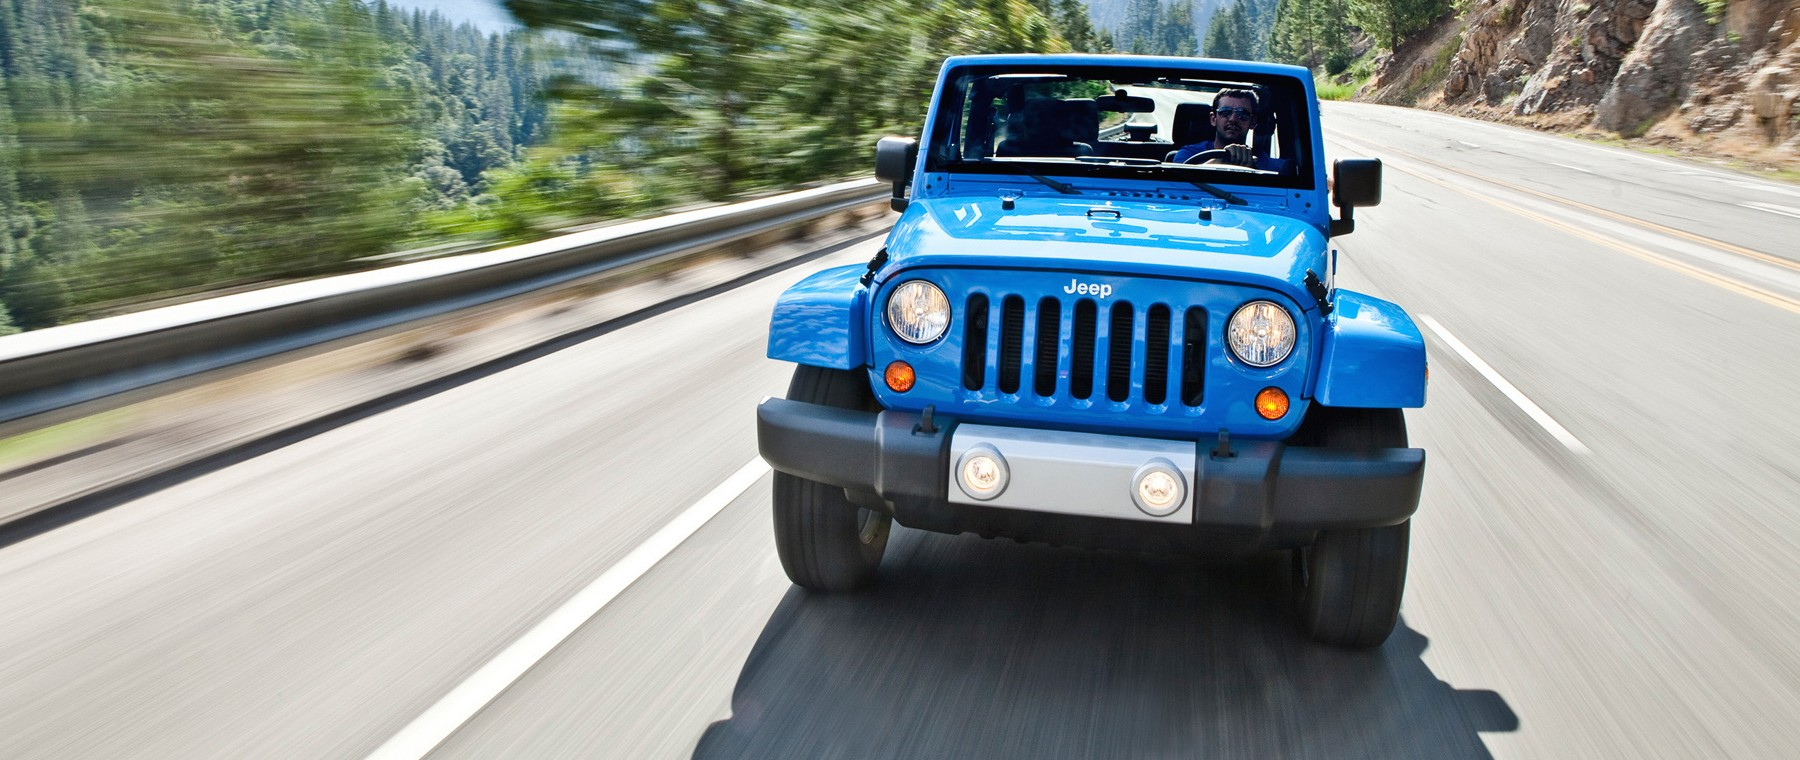 JeepWrangler4